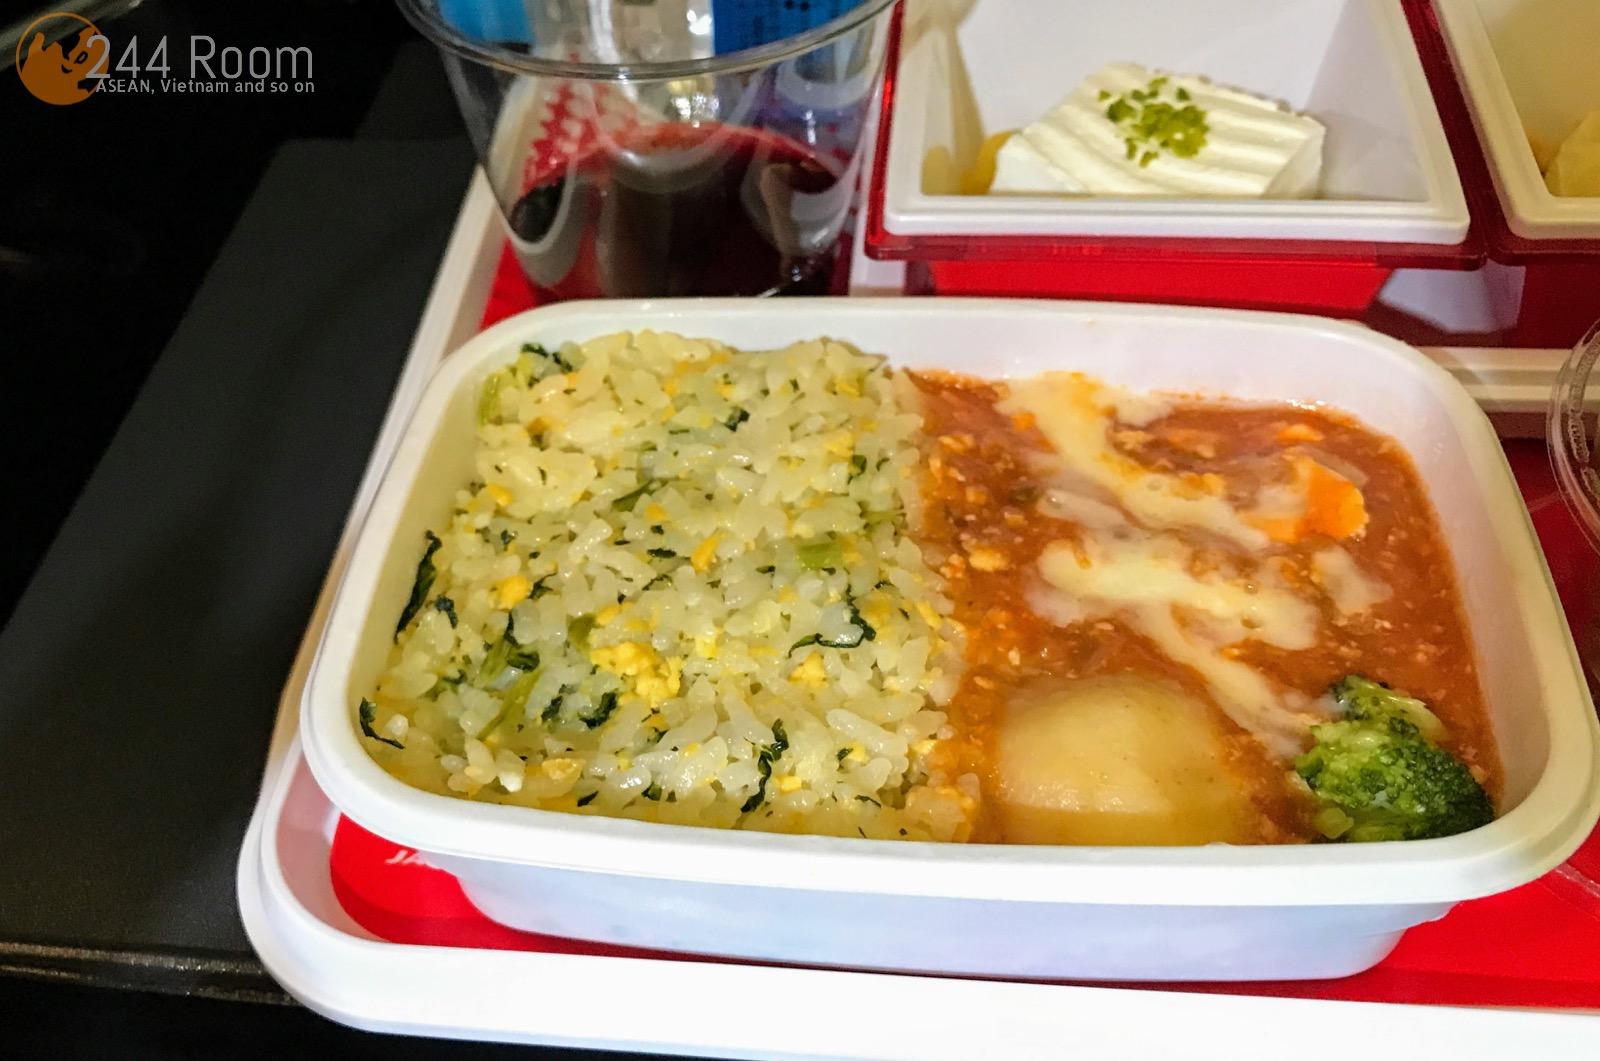 JALエコノミークラス機内食 JAL Economyclass-flightmeal2